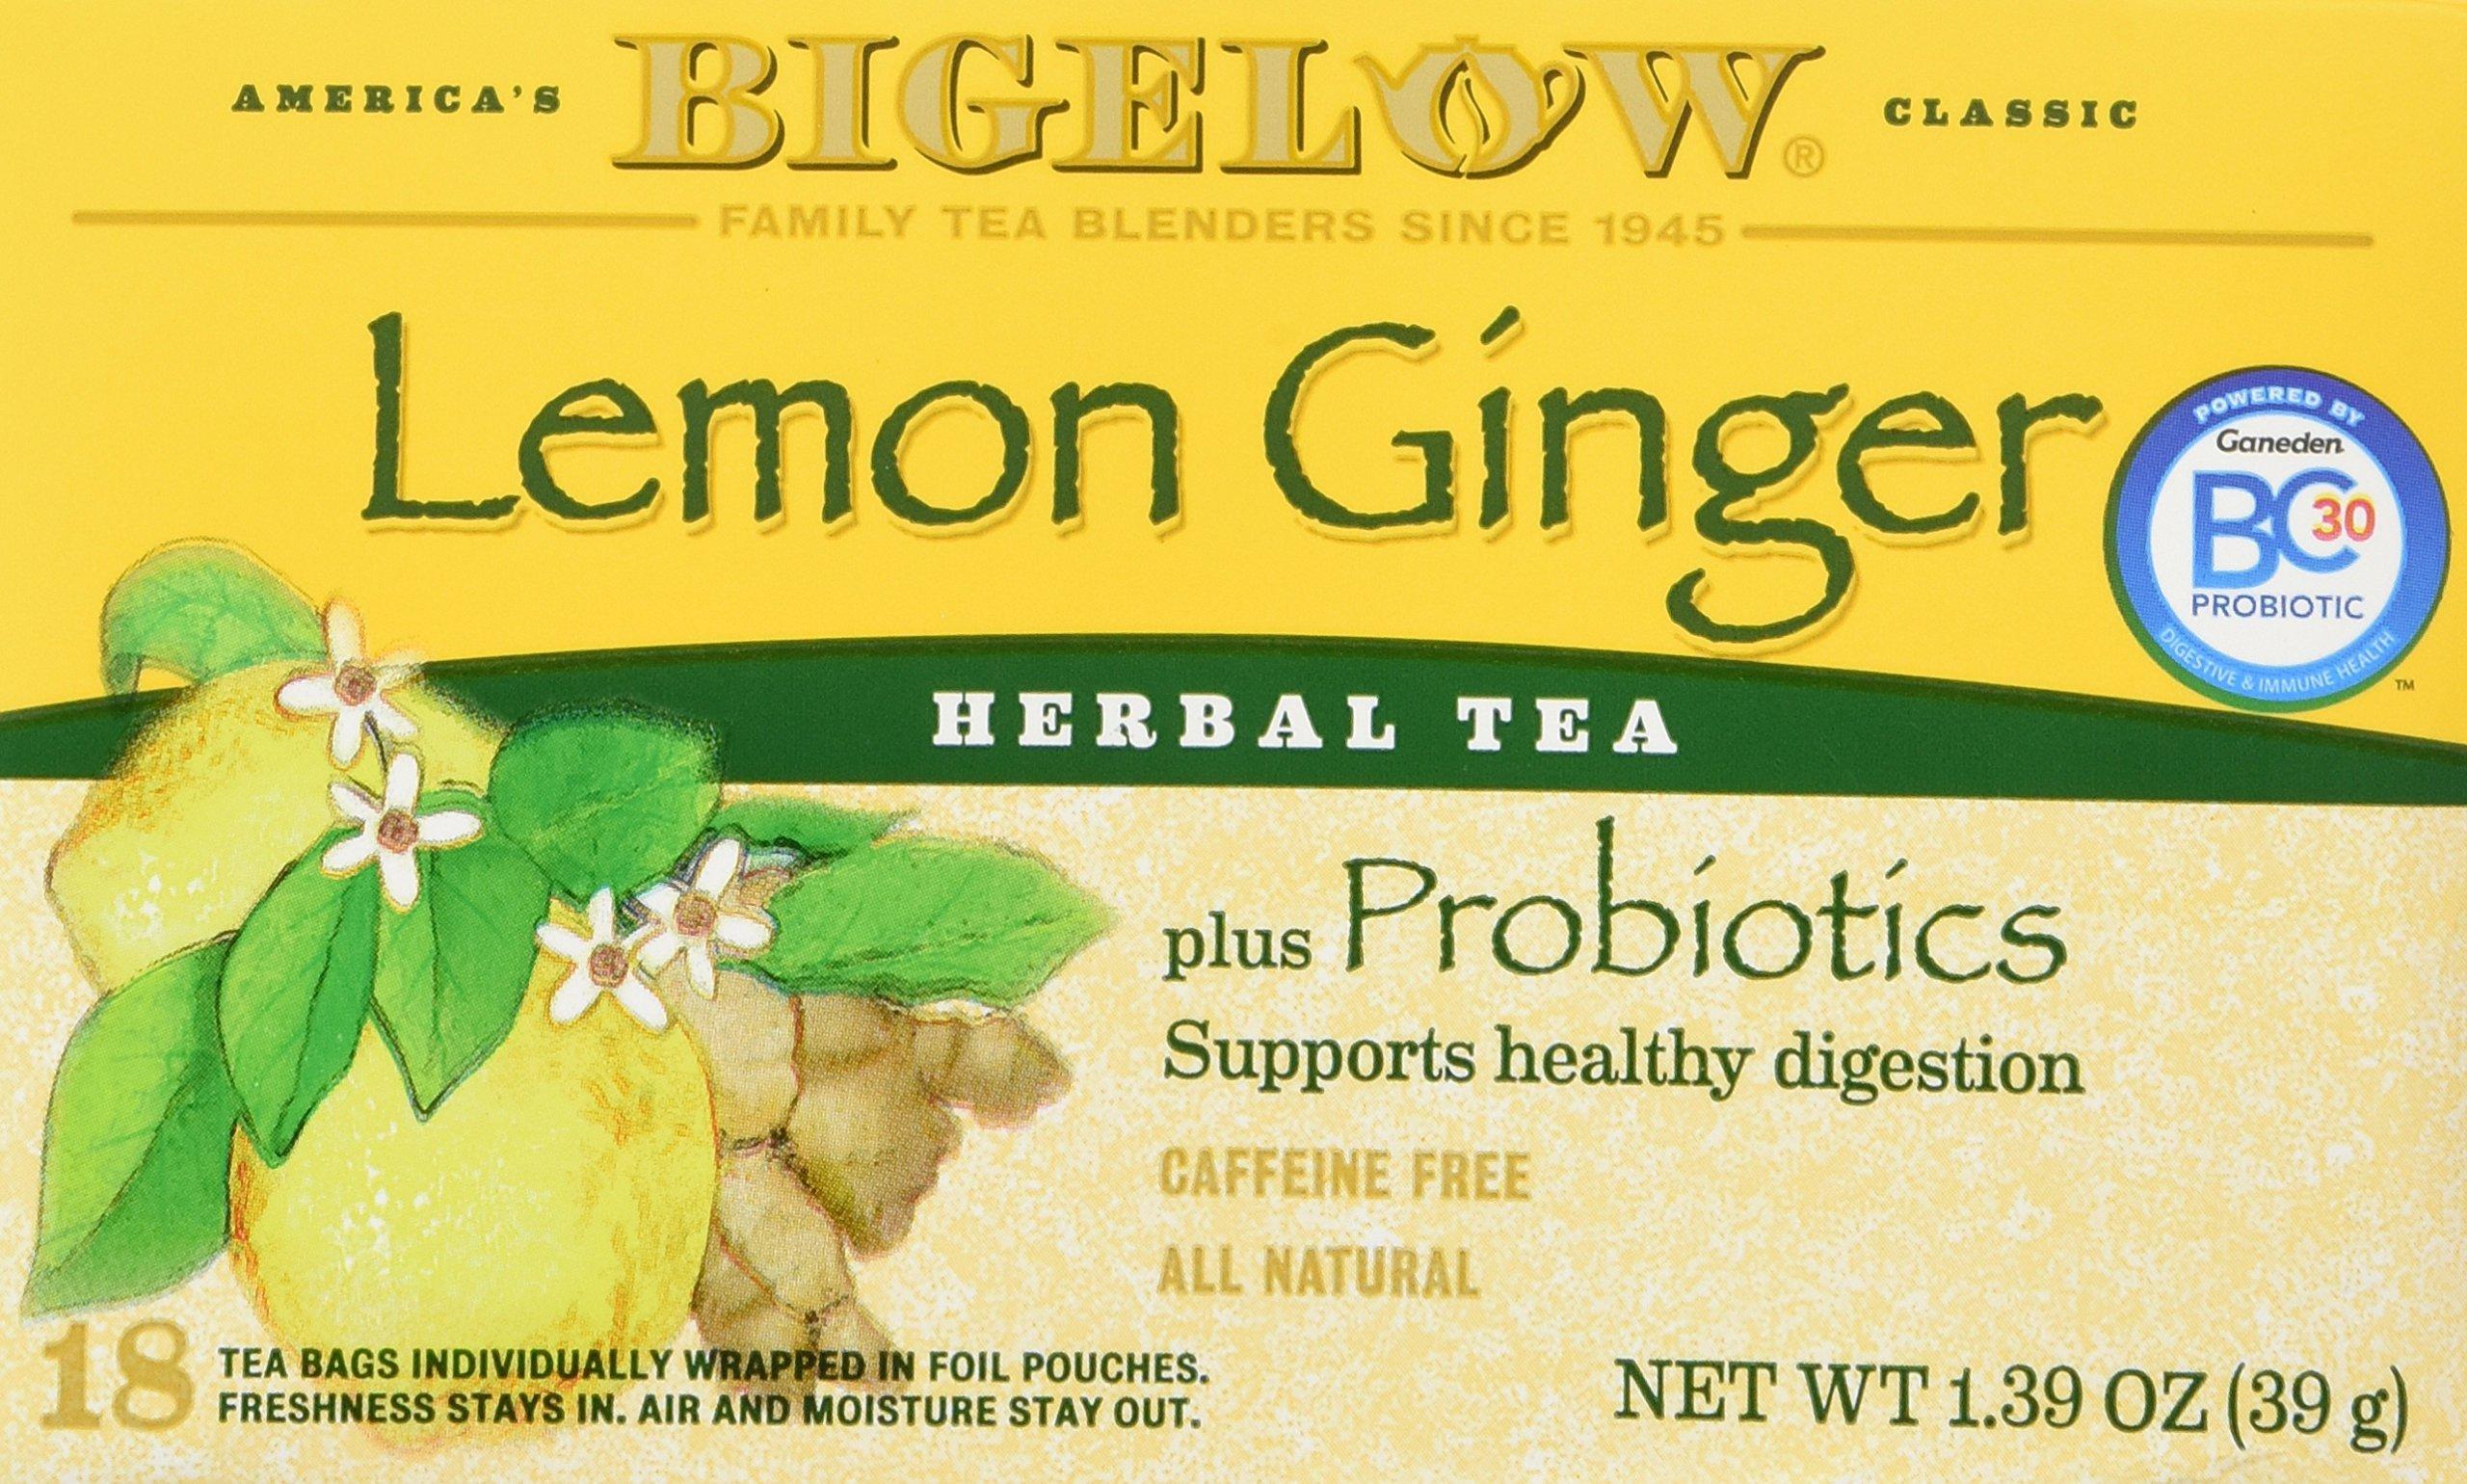 Bigelow Classic Lemon Ginger Herbal Tea Plus Probiotics 18 Bags (3 Pack) by Bigelow Tea (Image #1)